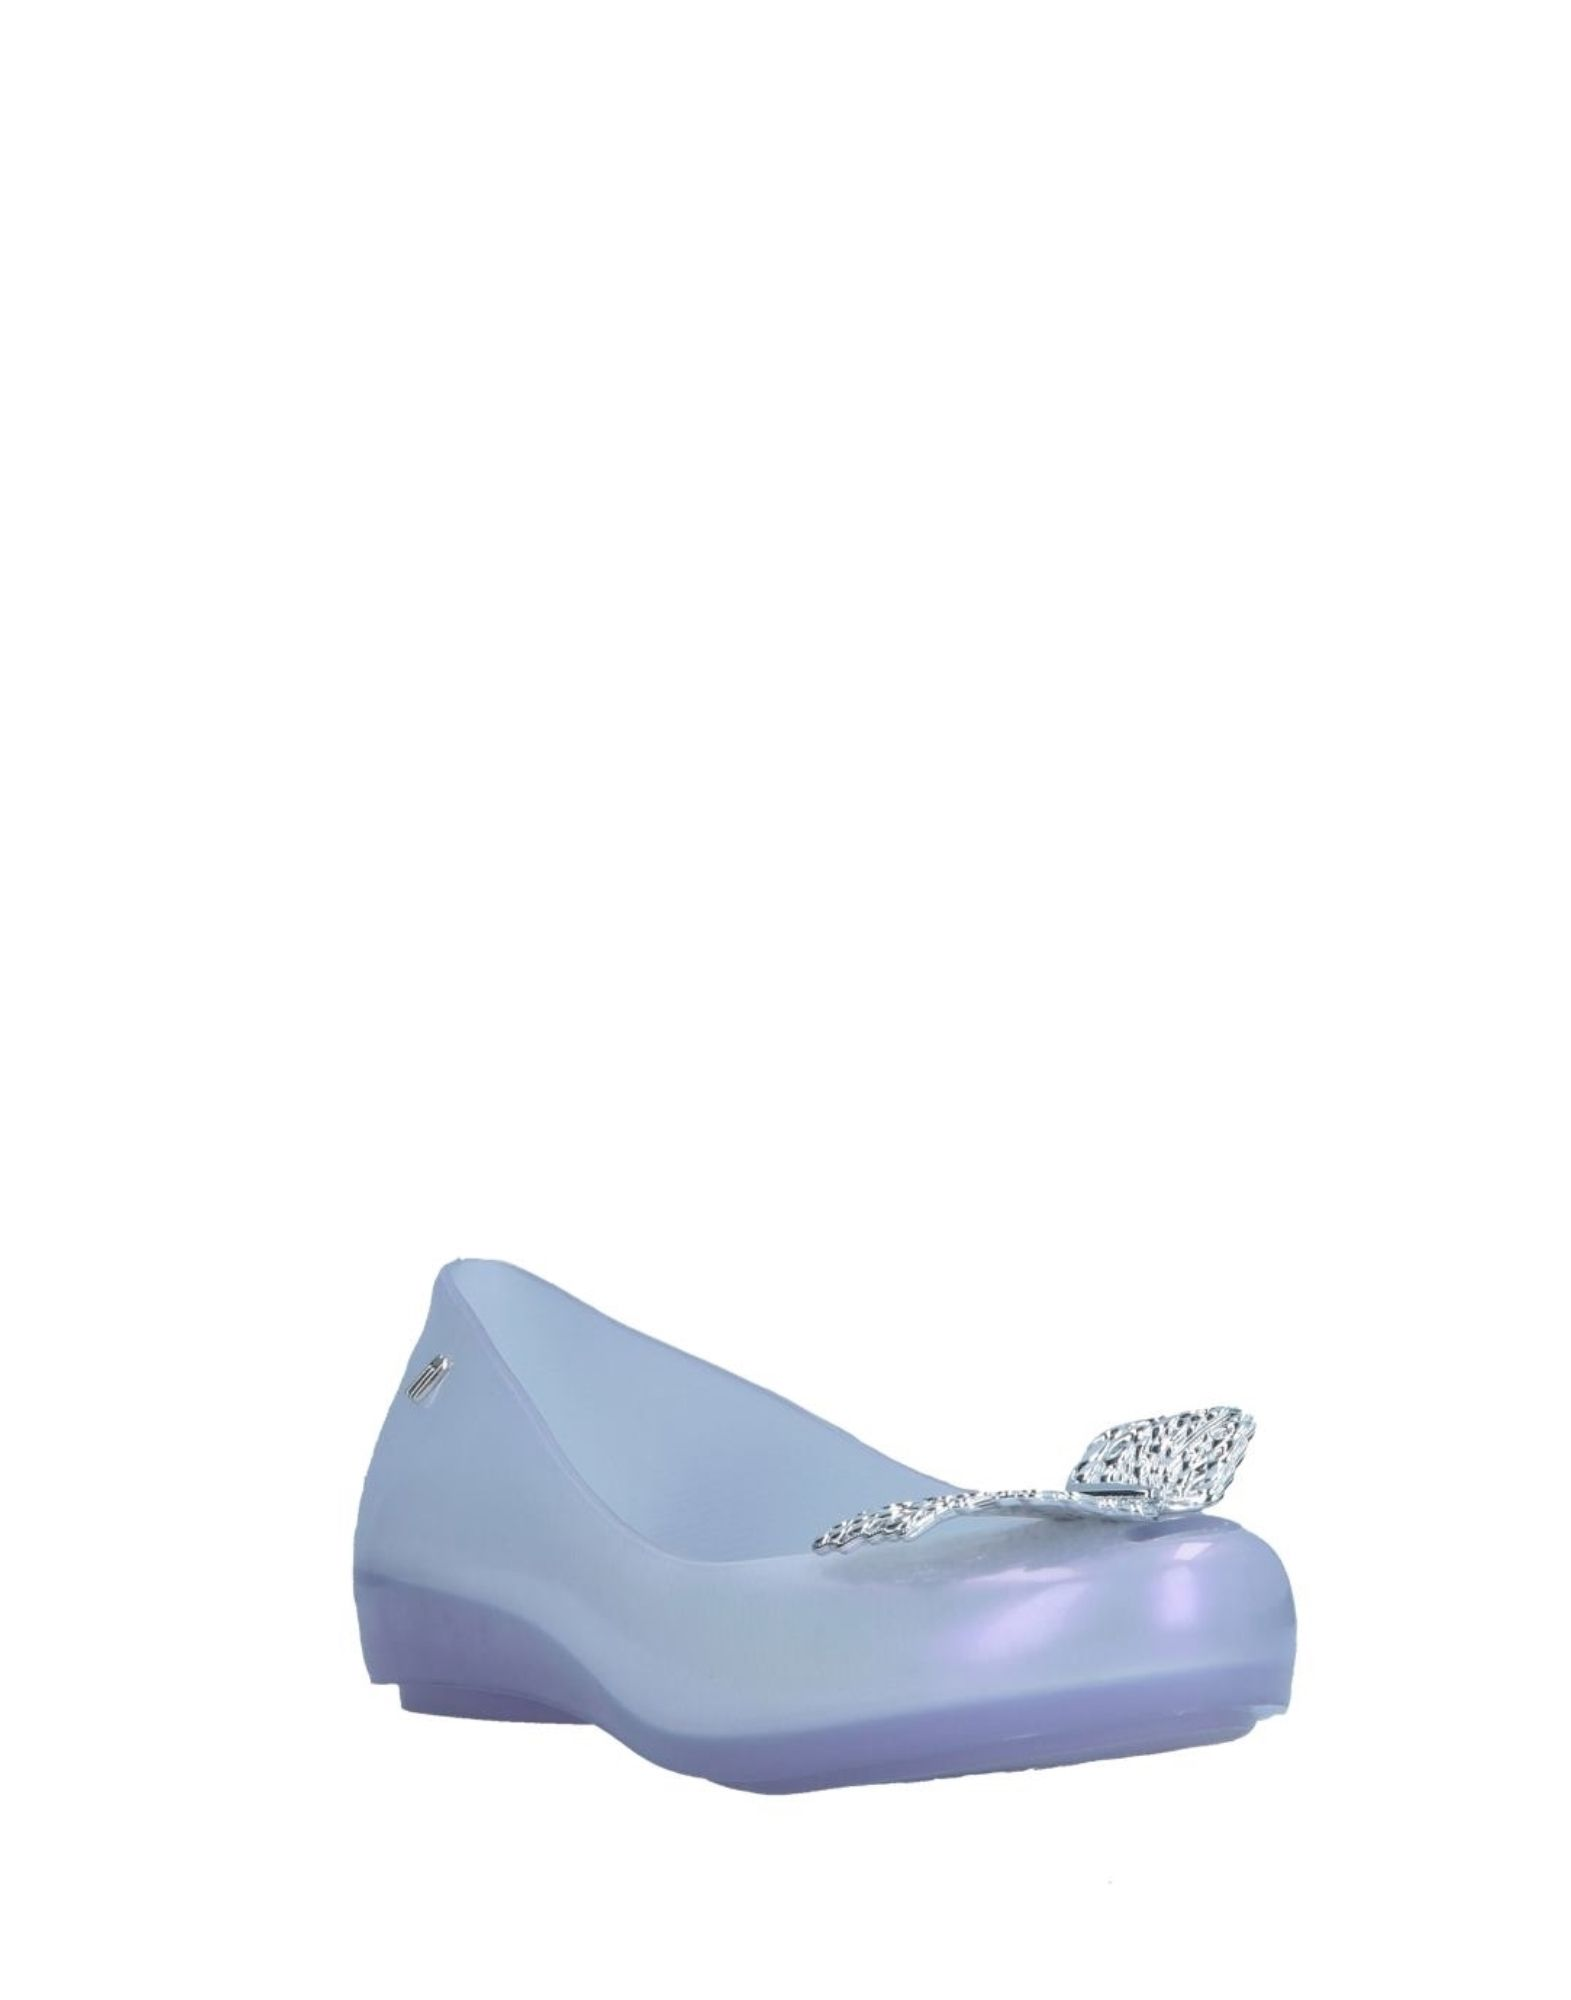 Melissa Ballerinas Gute Damen  11288962WW Gute Ballerinas Qualität beliebte Schuhe e4f742